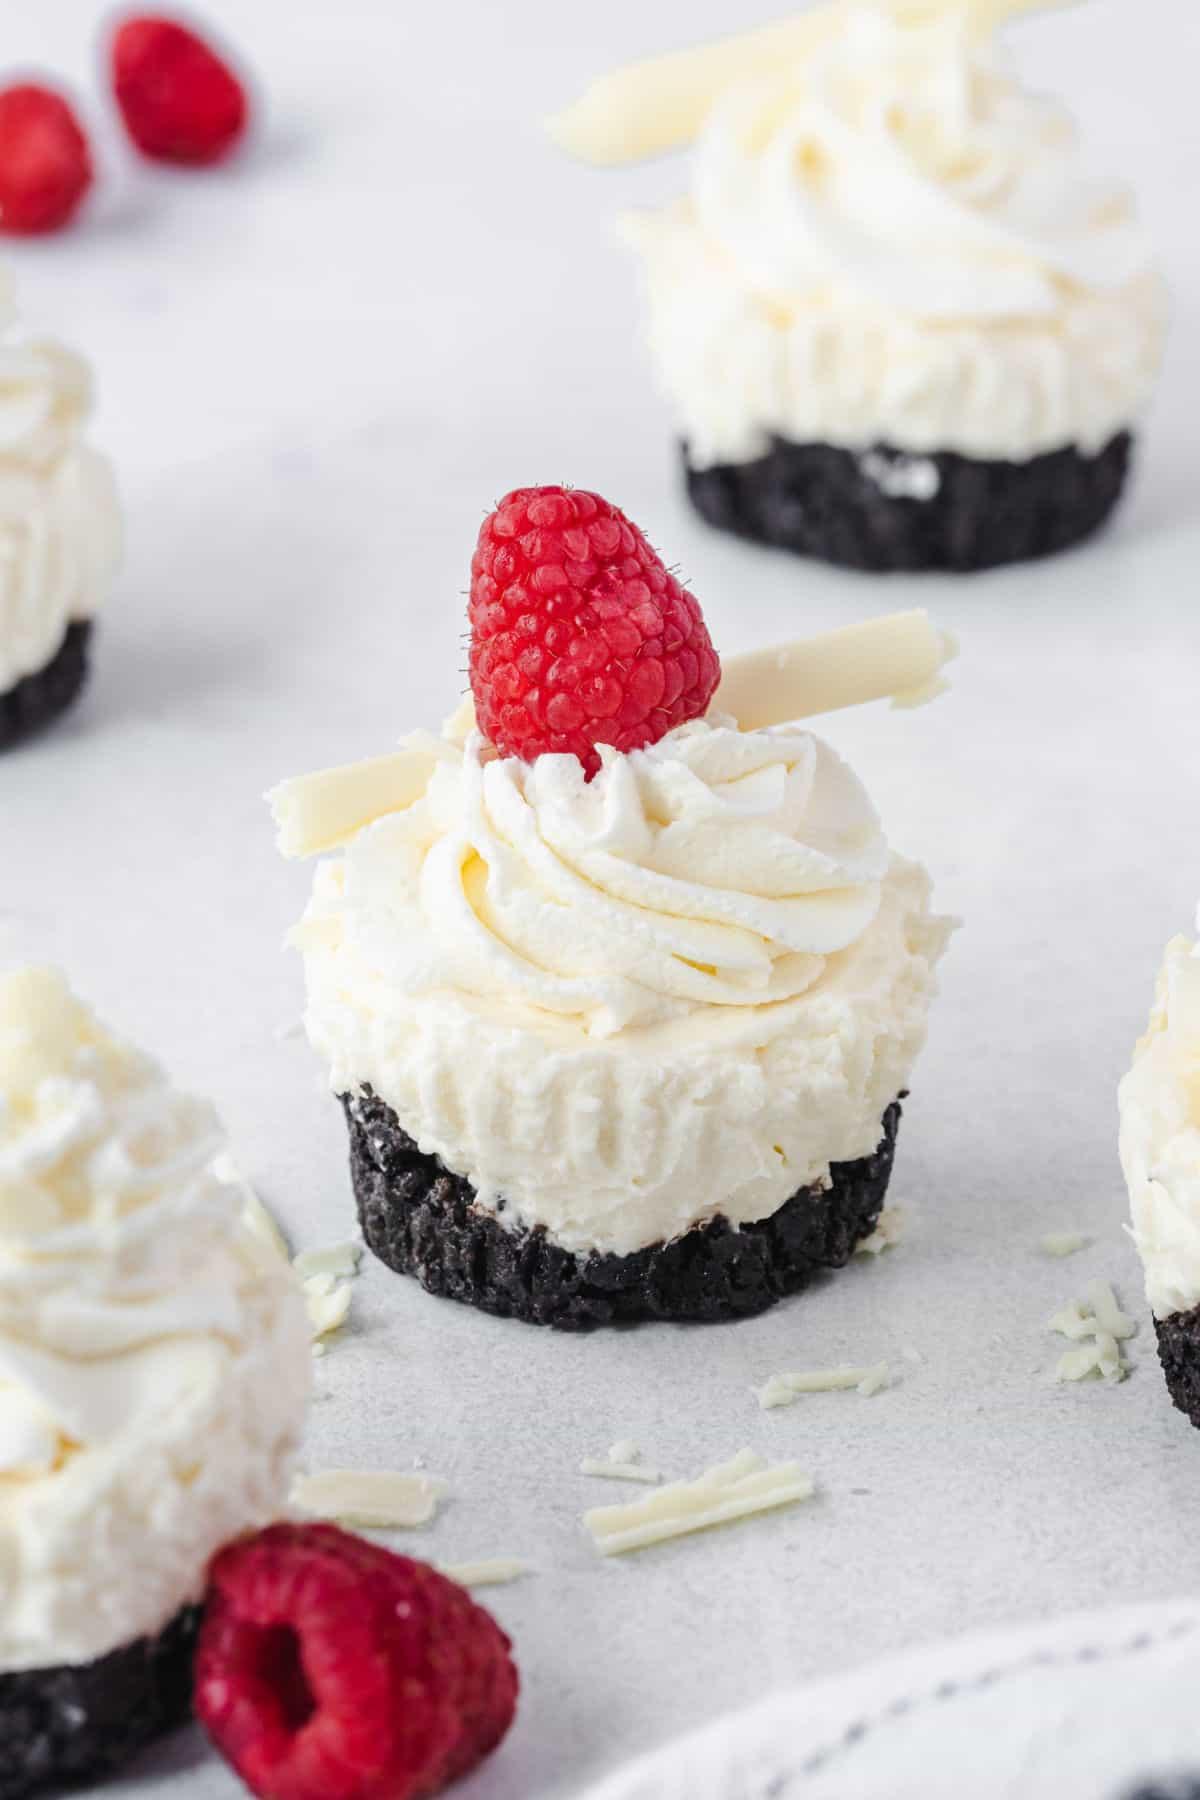 Mini cheesecake with oreo crust and a raspberry on top.